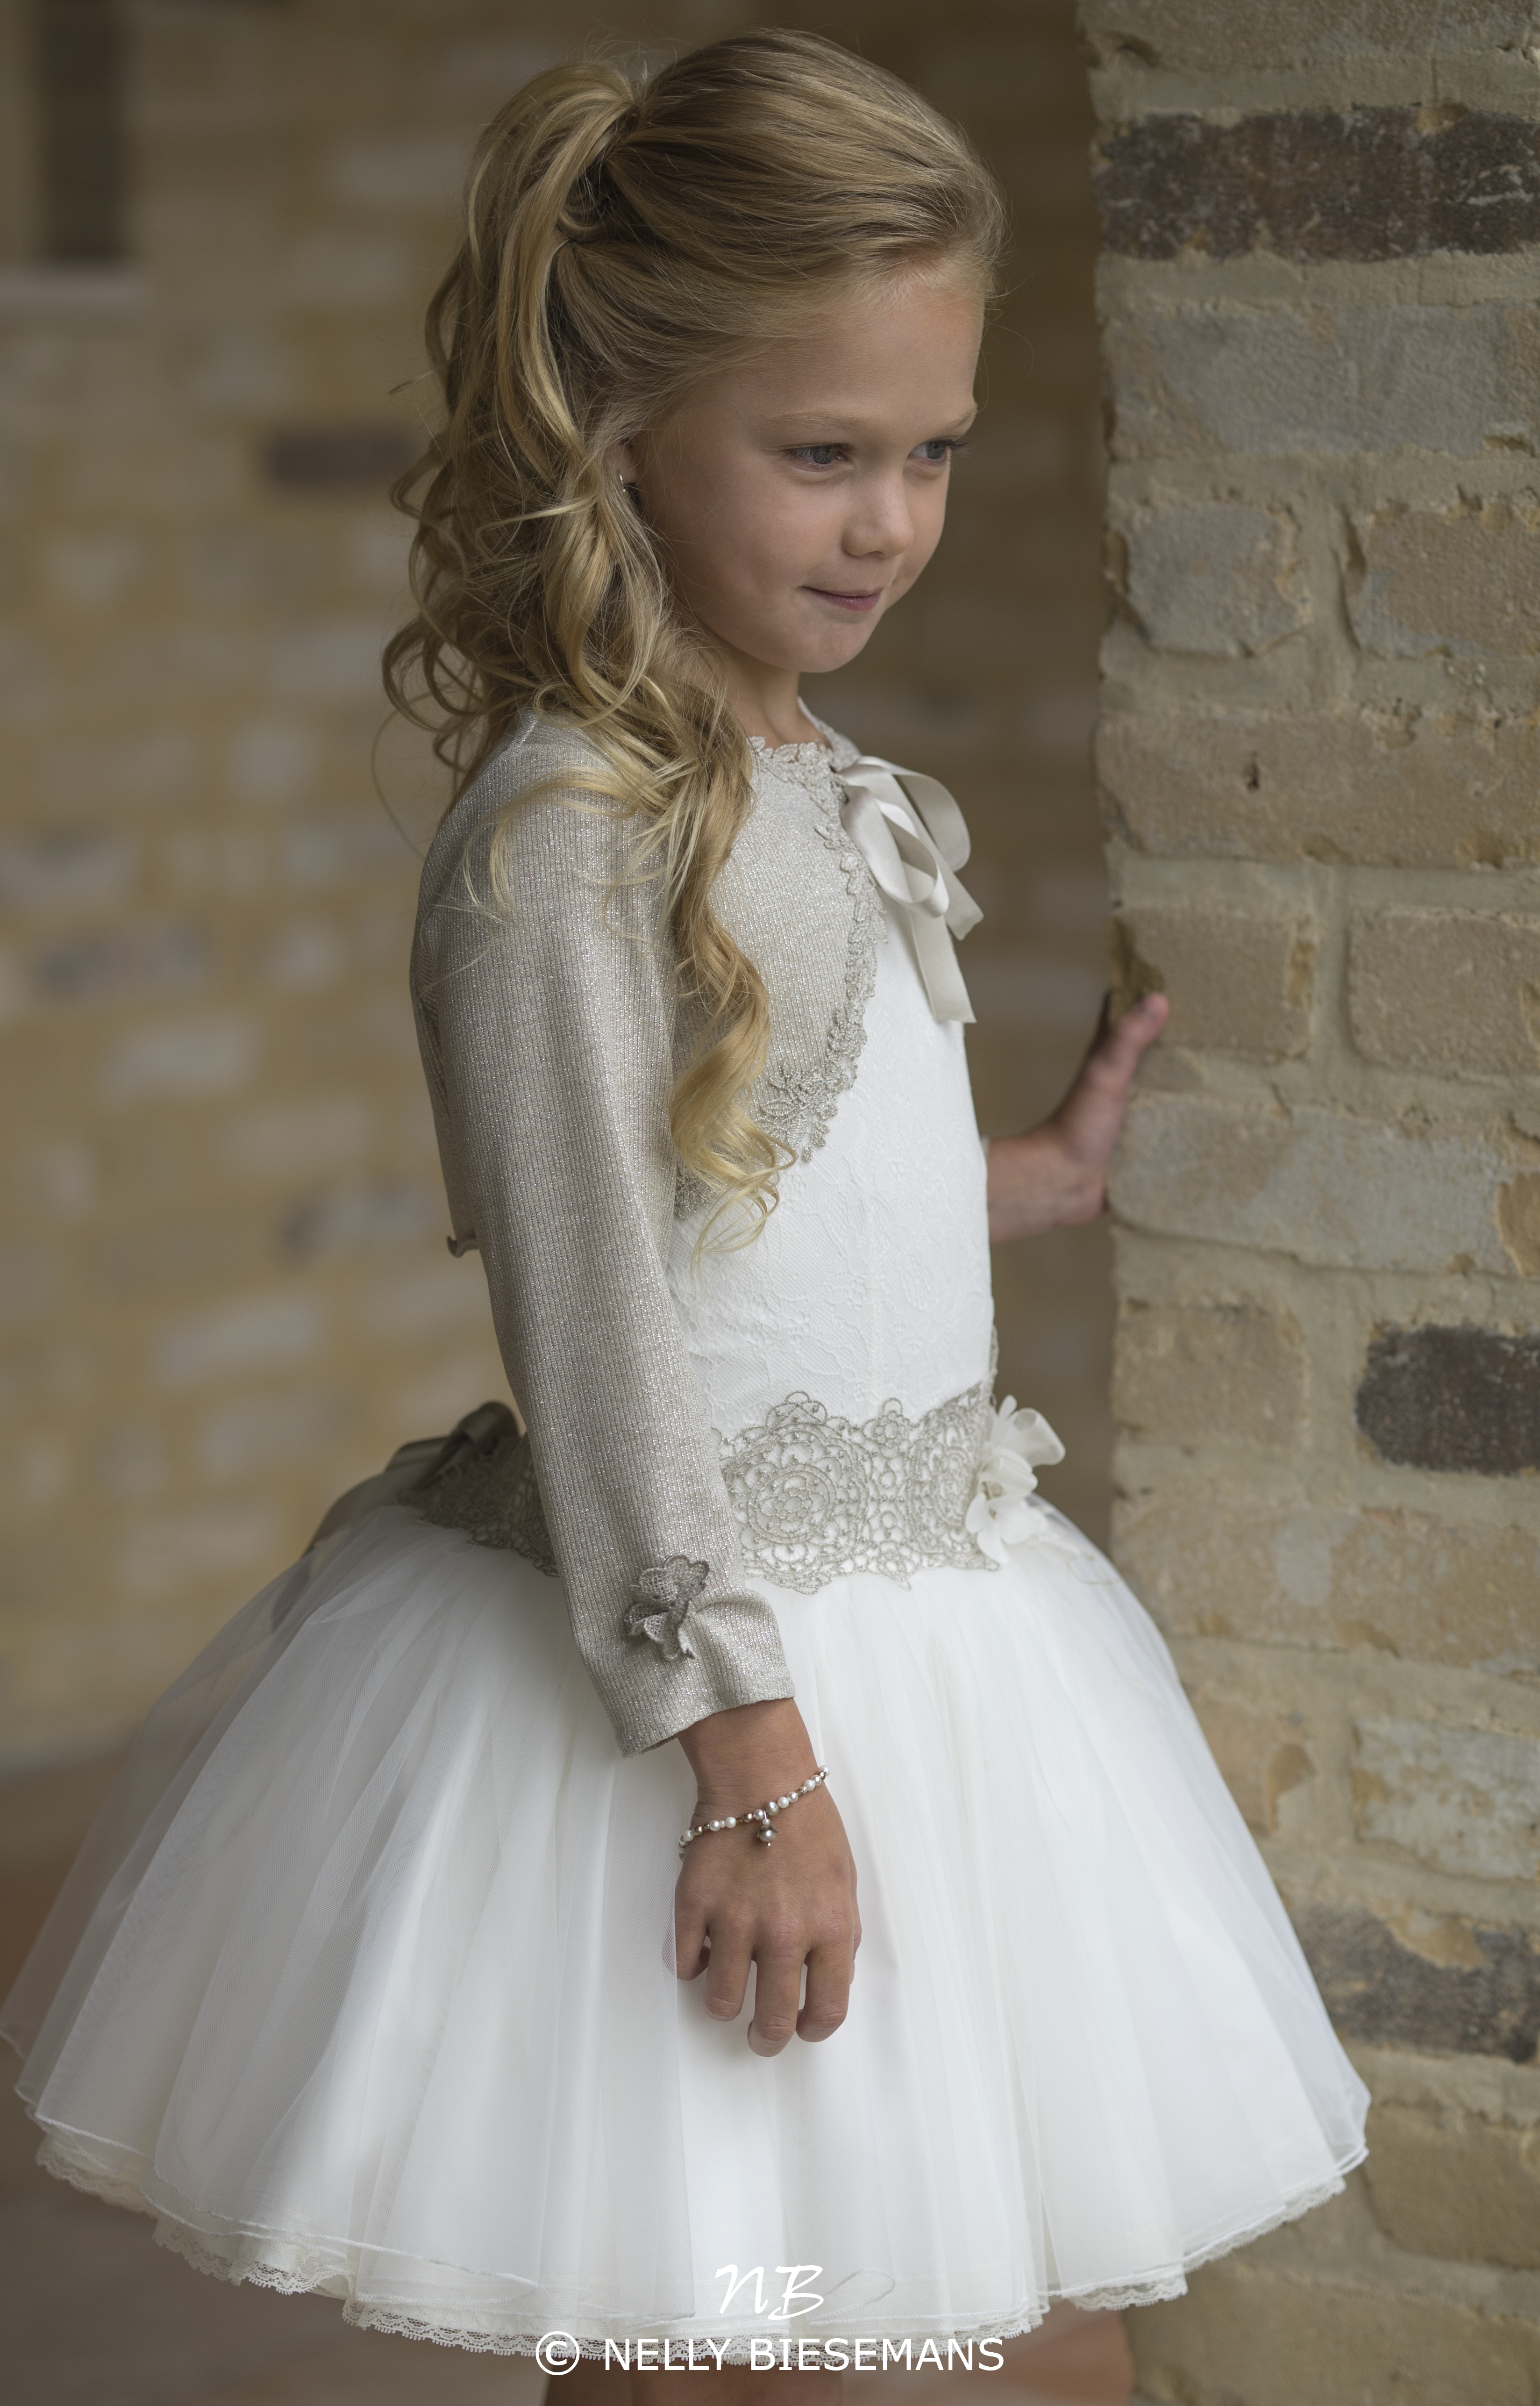 exclusieve communiejurk – bruidsmeisje – vormsel – Nelly Biesemans – www.nb4kids.com – A19K15(5)